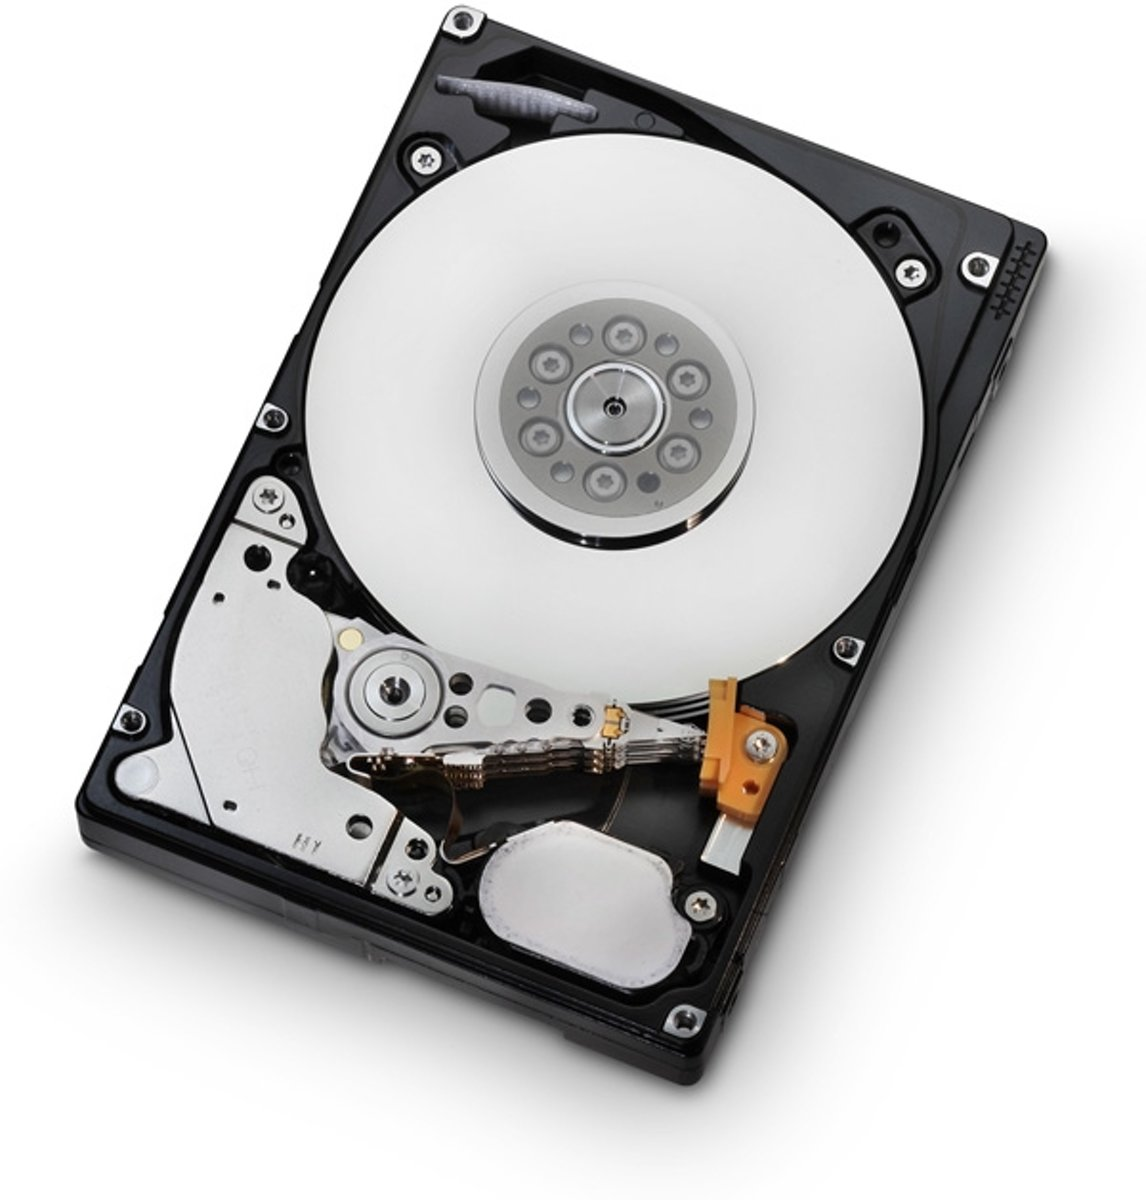 HGST Ultrastar C10K900 600GB kopen